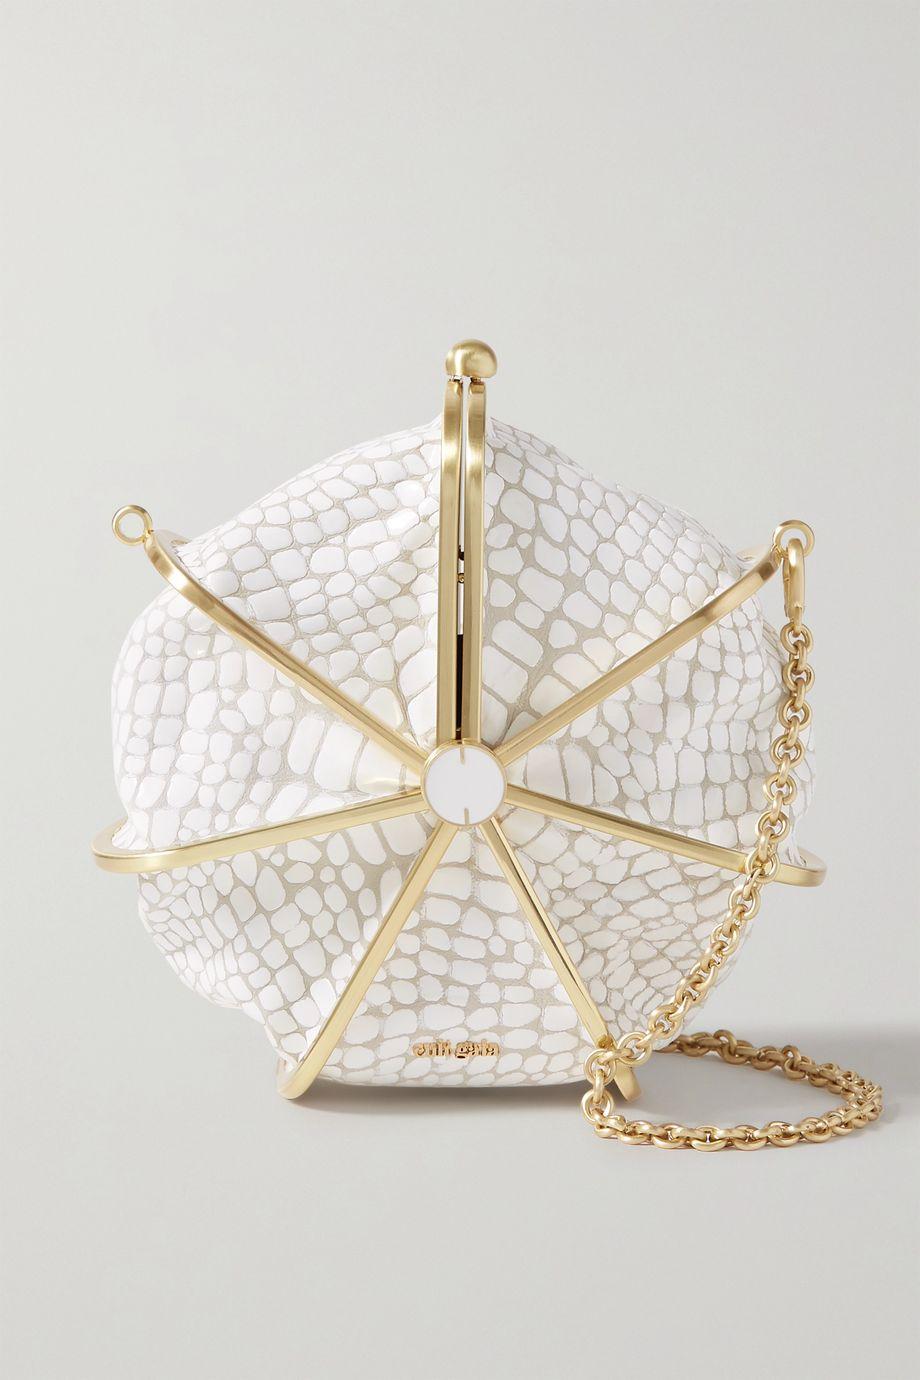 Cult Gaia Nika croc-effect leather shoulder bag